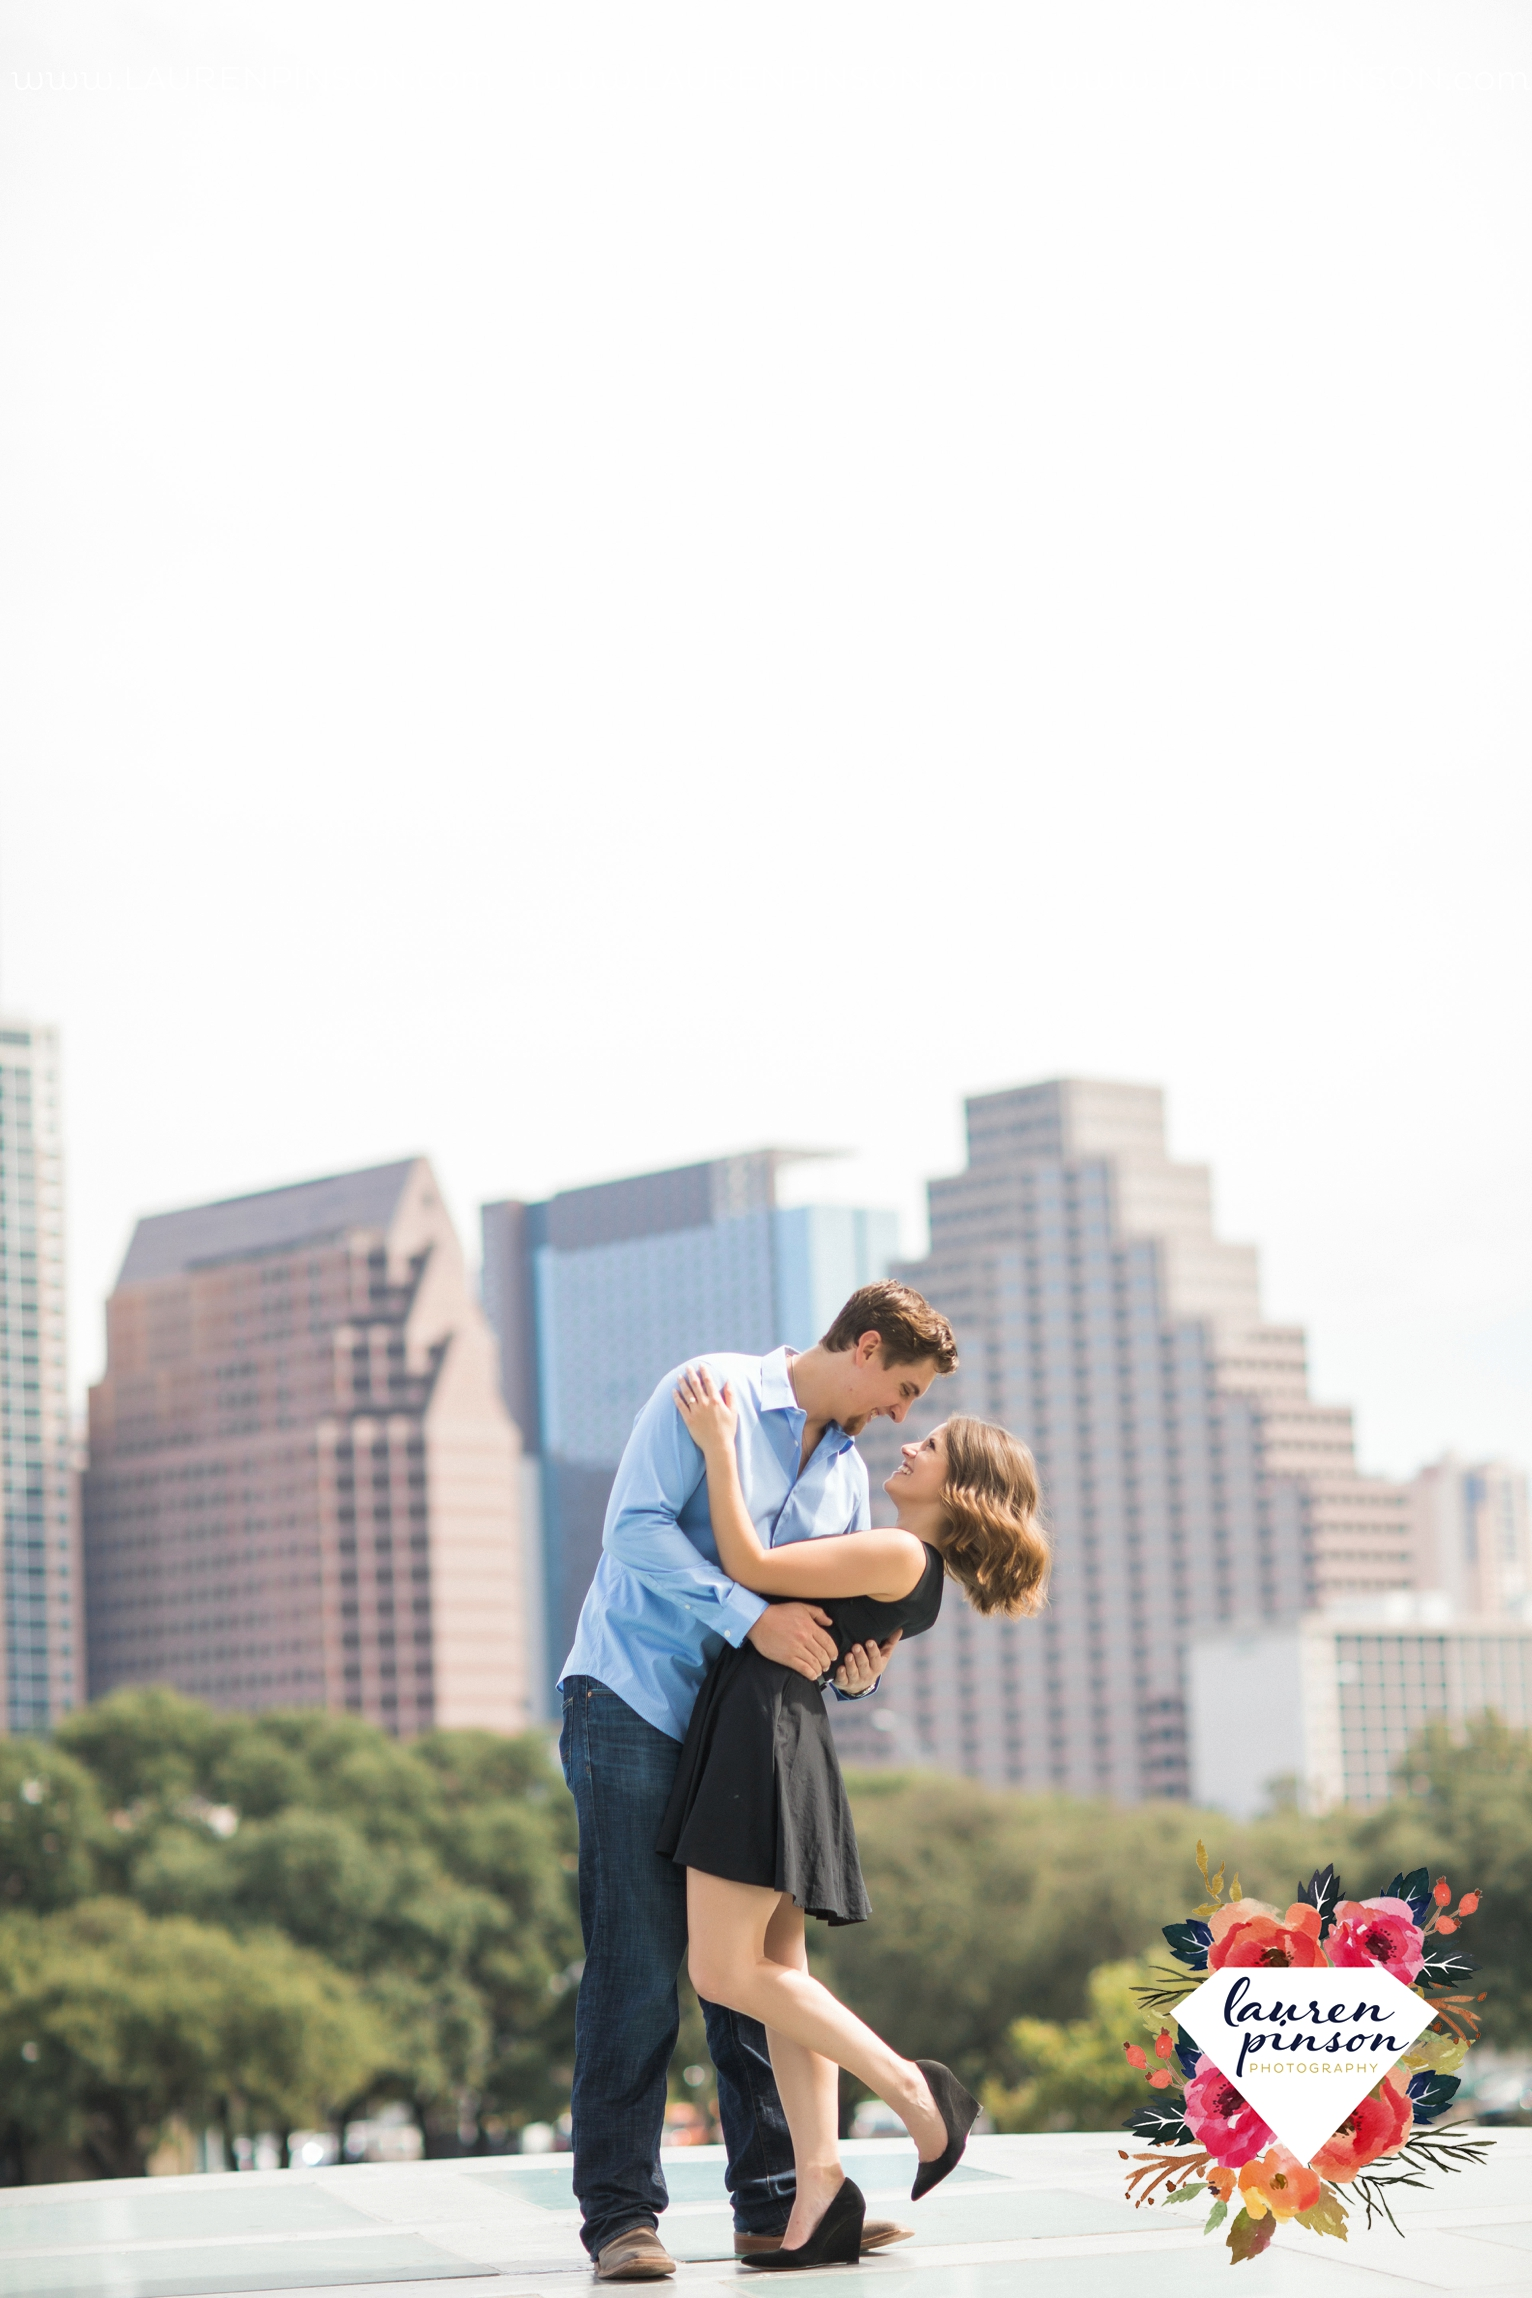 austin-texas-engagement-session-photography-by-wichita-falls-wedding-photgraphy-lauren-pinson_1409.jpg